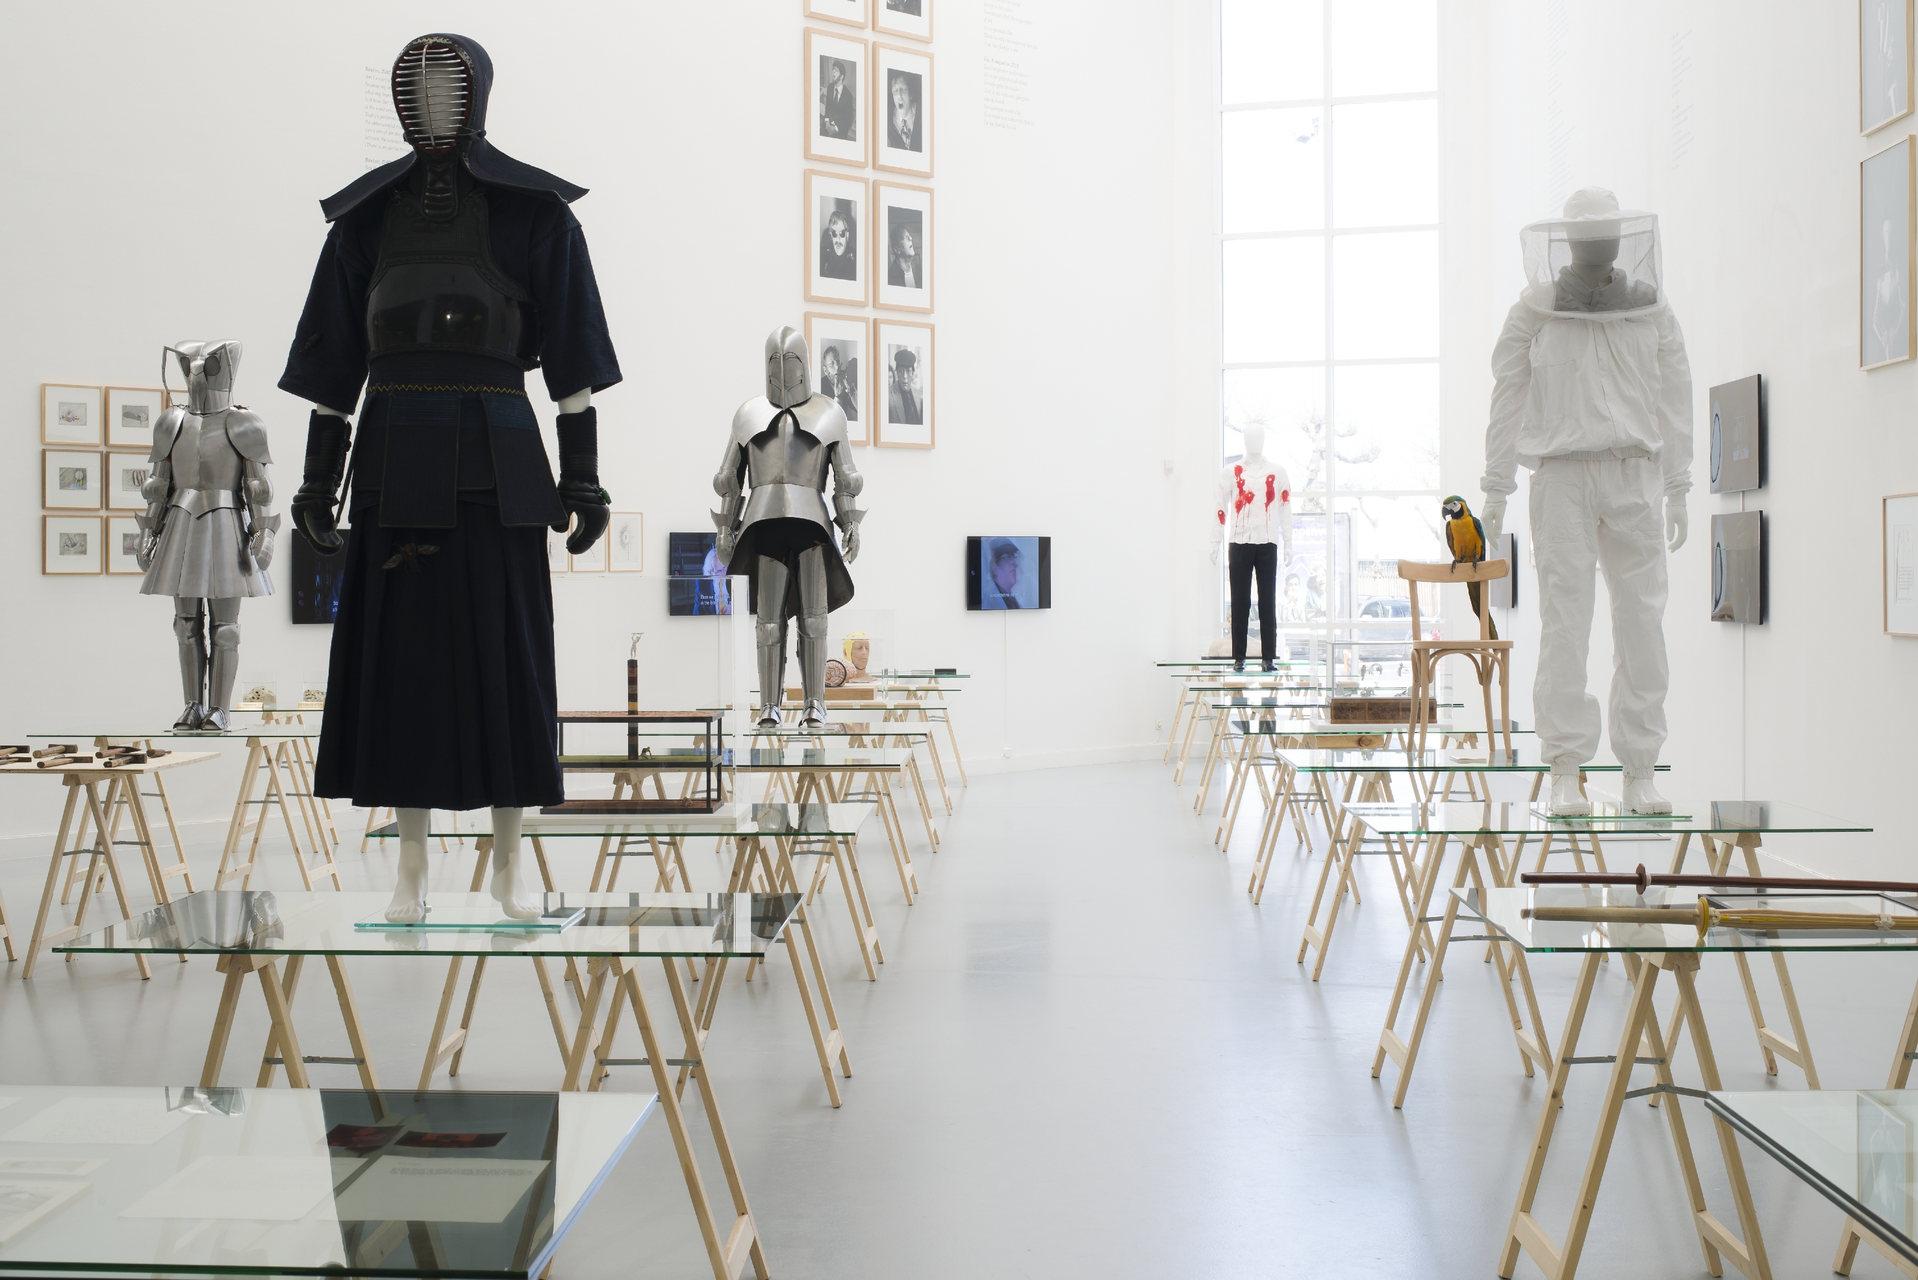 Jan_Fabre,_exhibition_view_M_HKA_2015_photo_M_HKAclinckx12